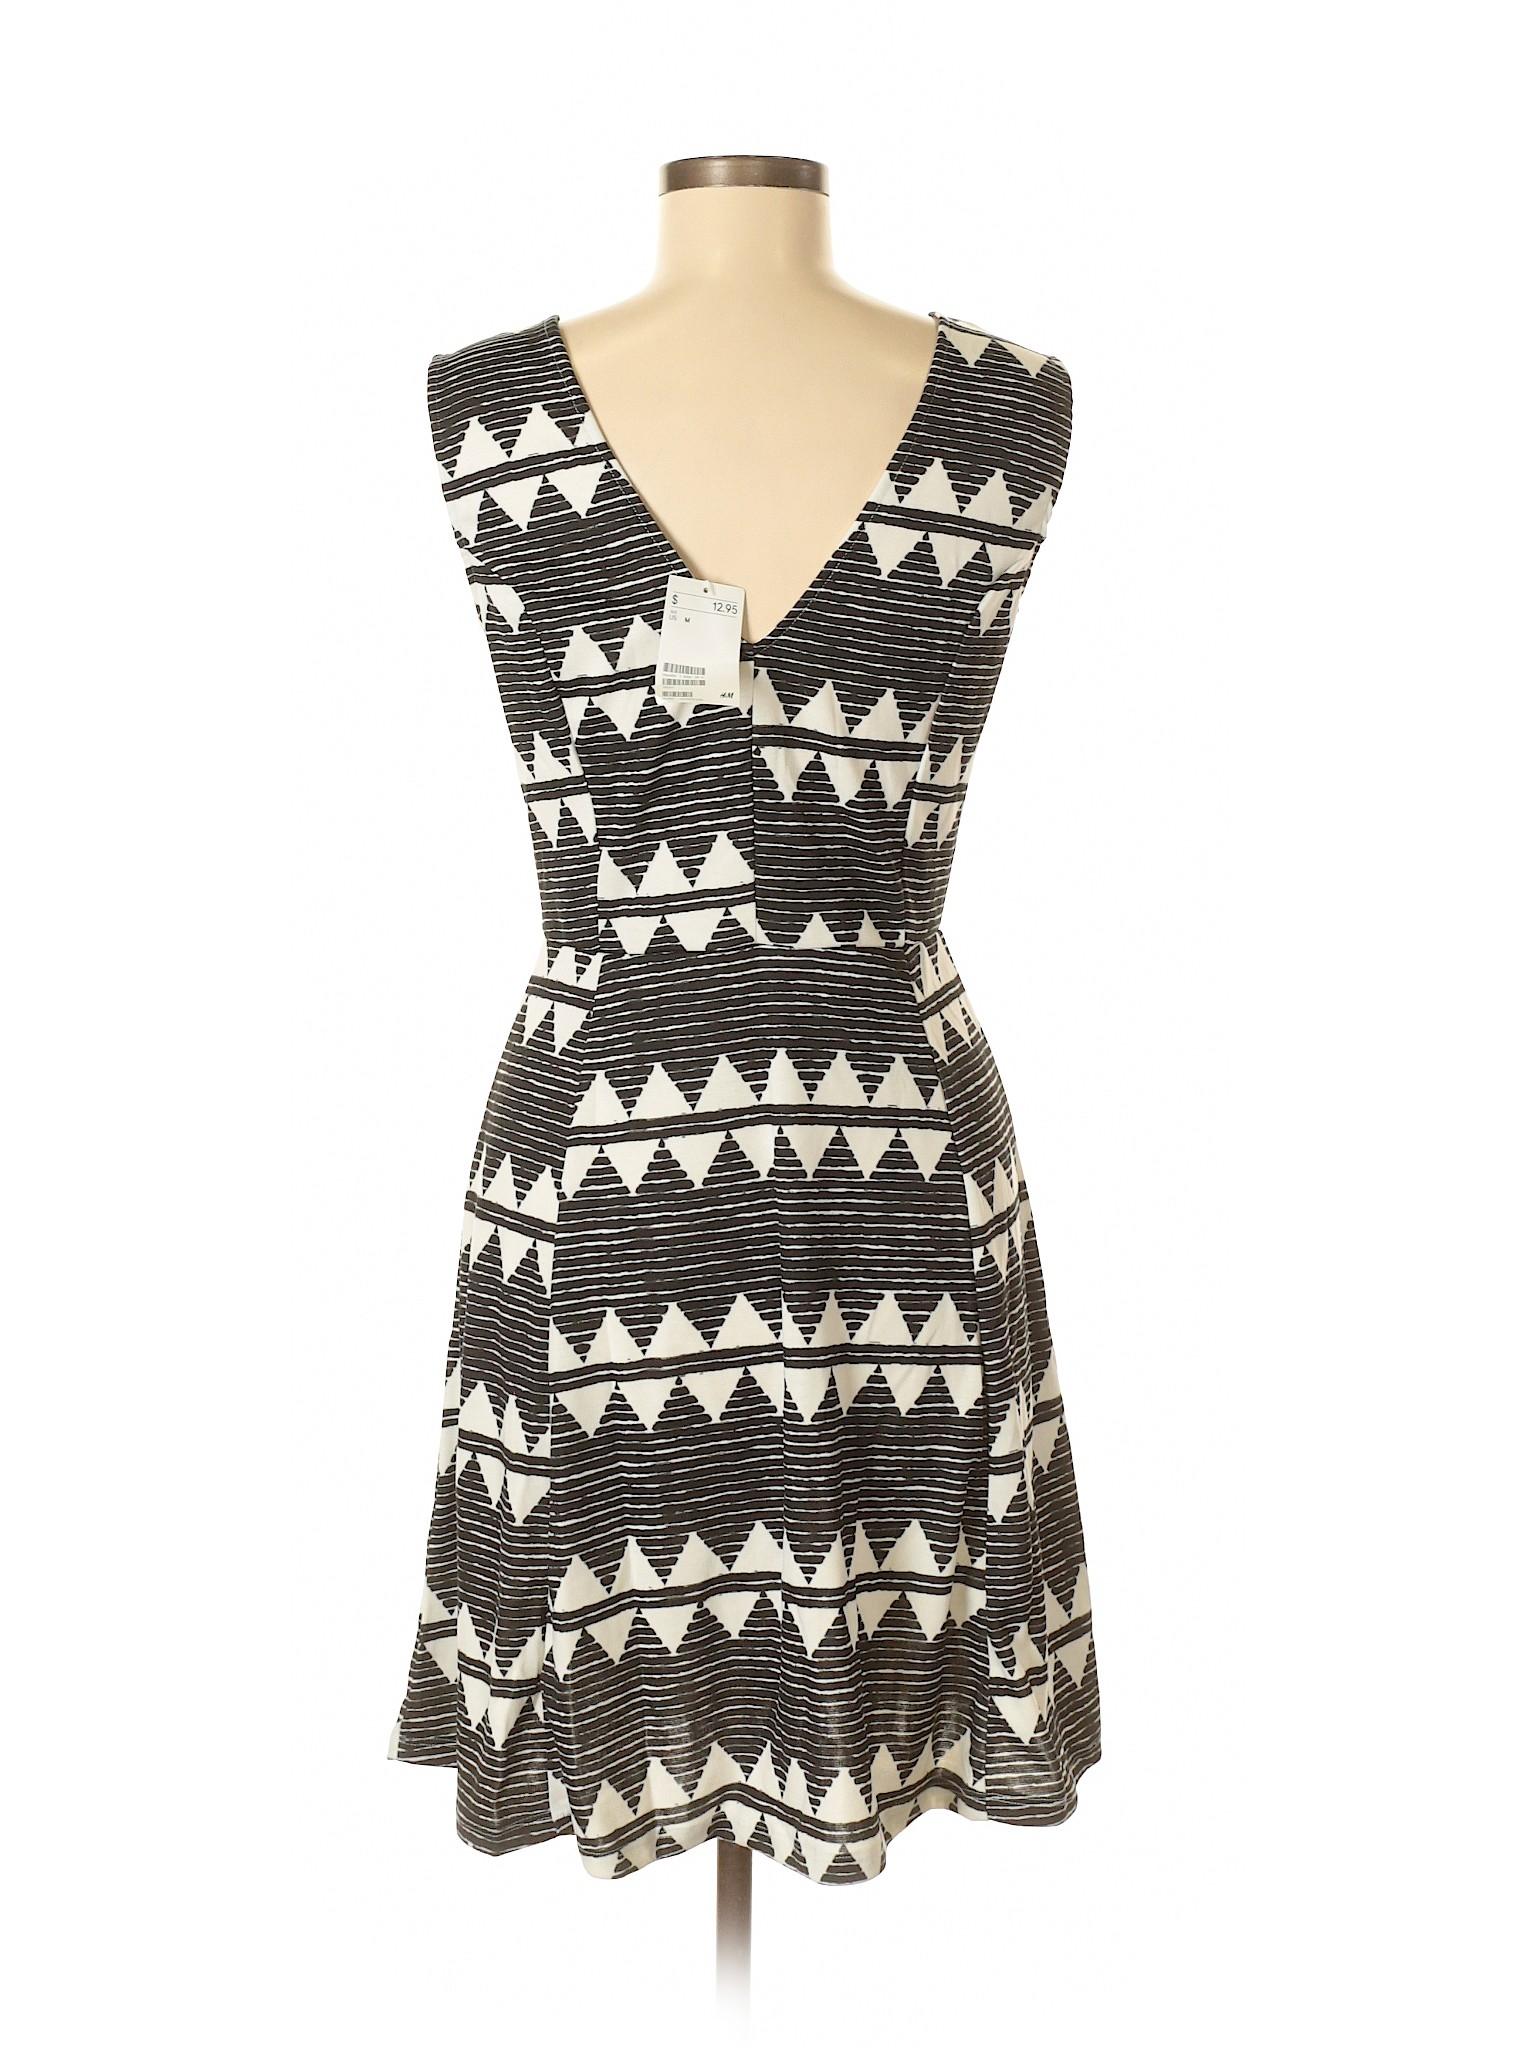 H amp;M Casual Dress winter Boutique 5PxwFqTEY